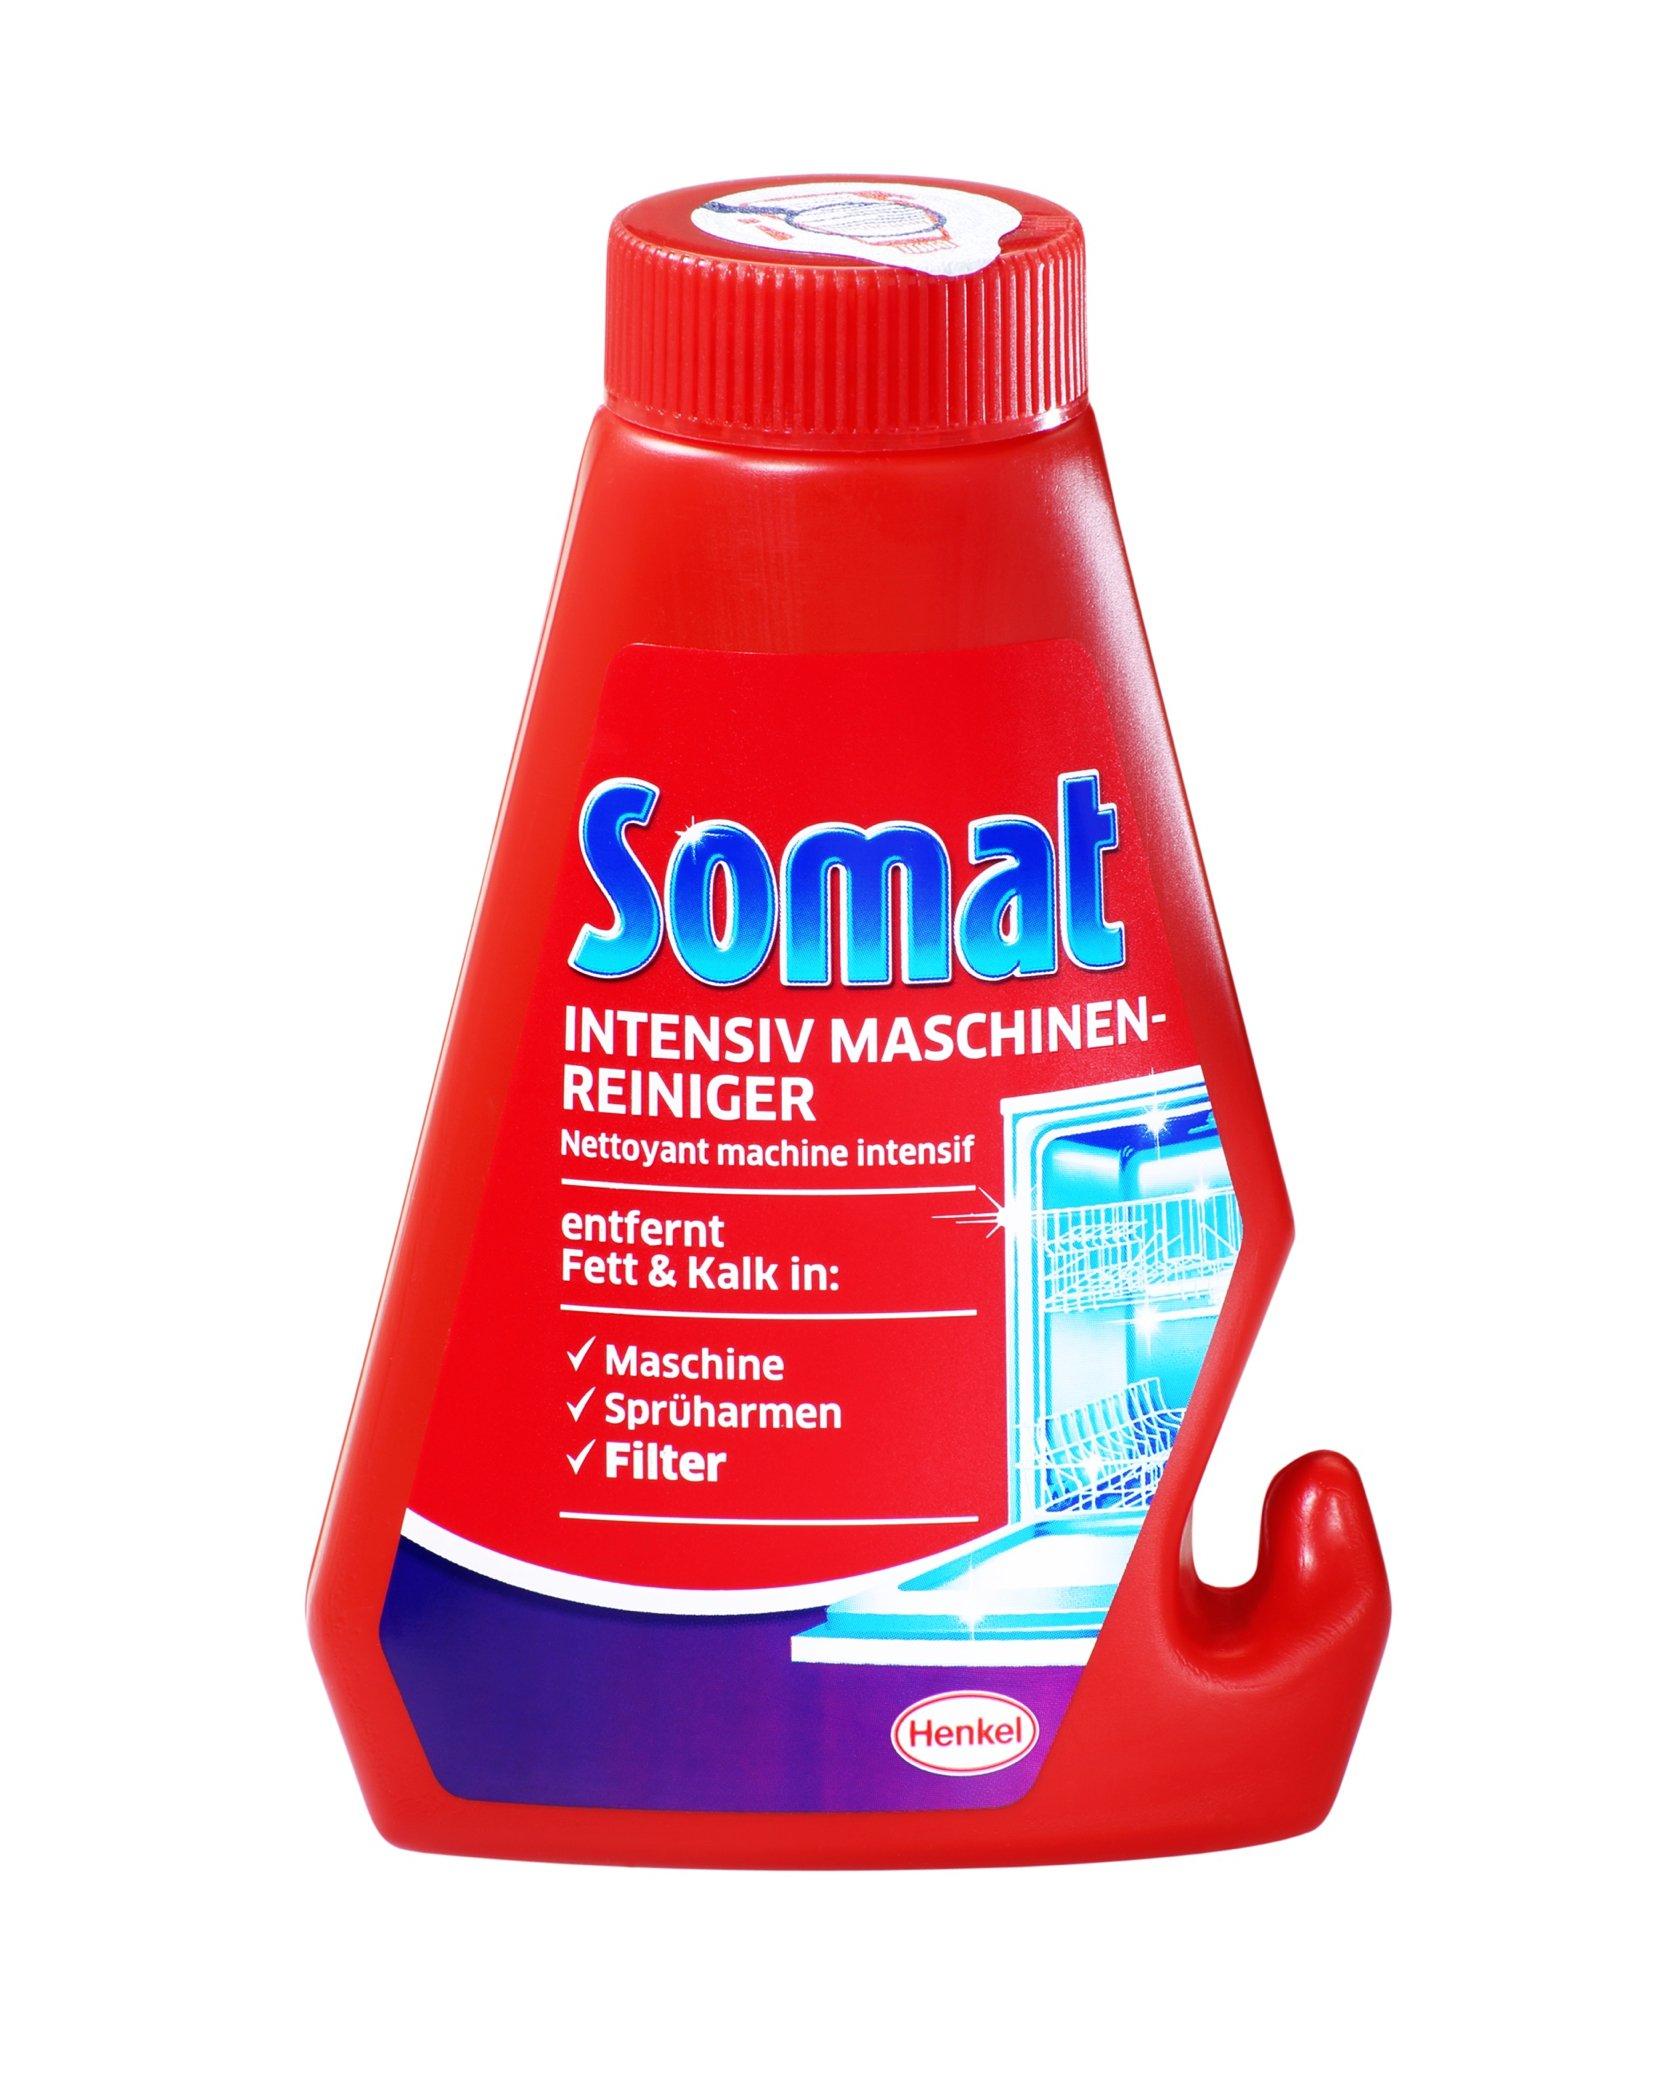 Somat Maschinen Reiniger, 250 Ml Product Image